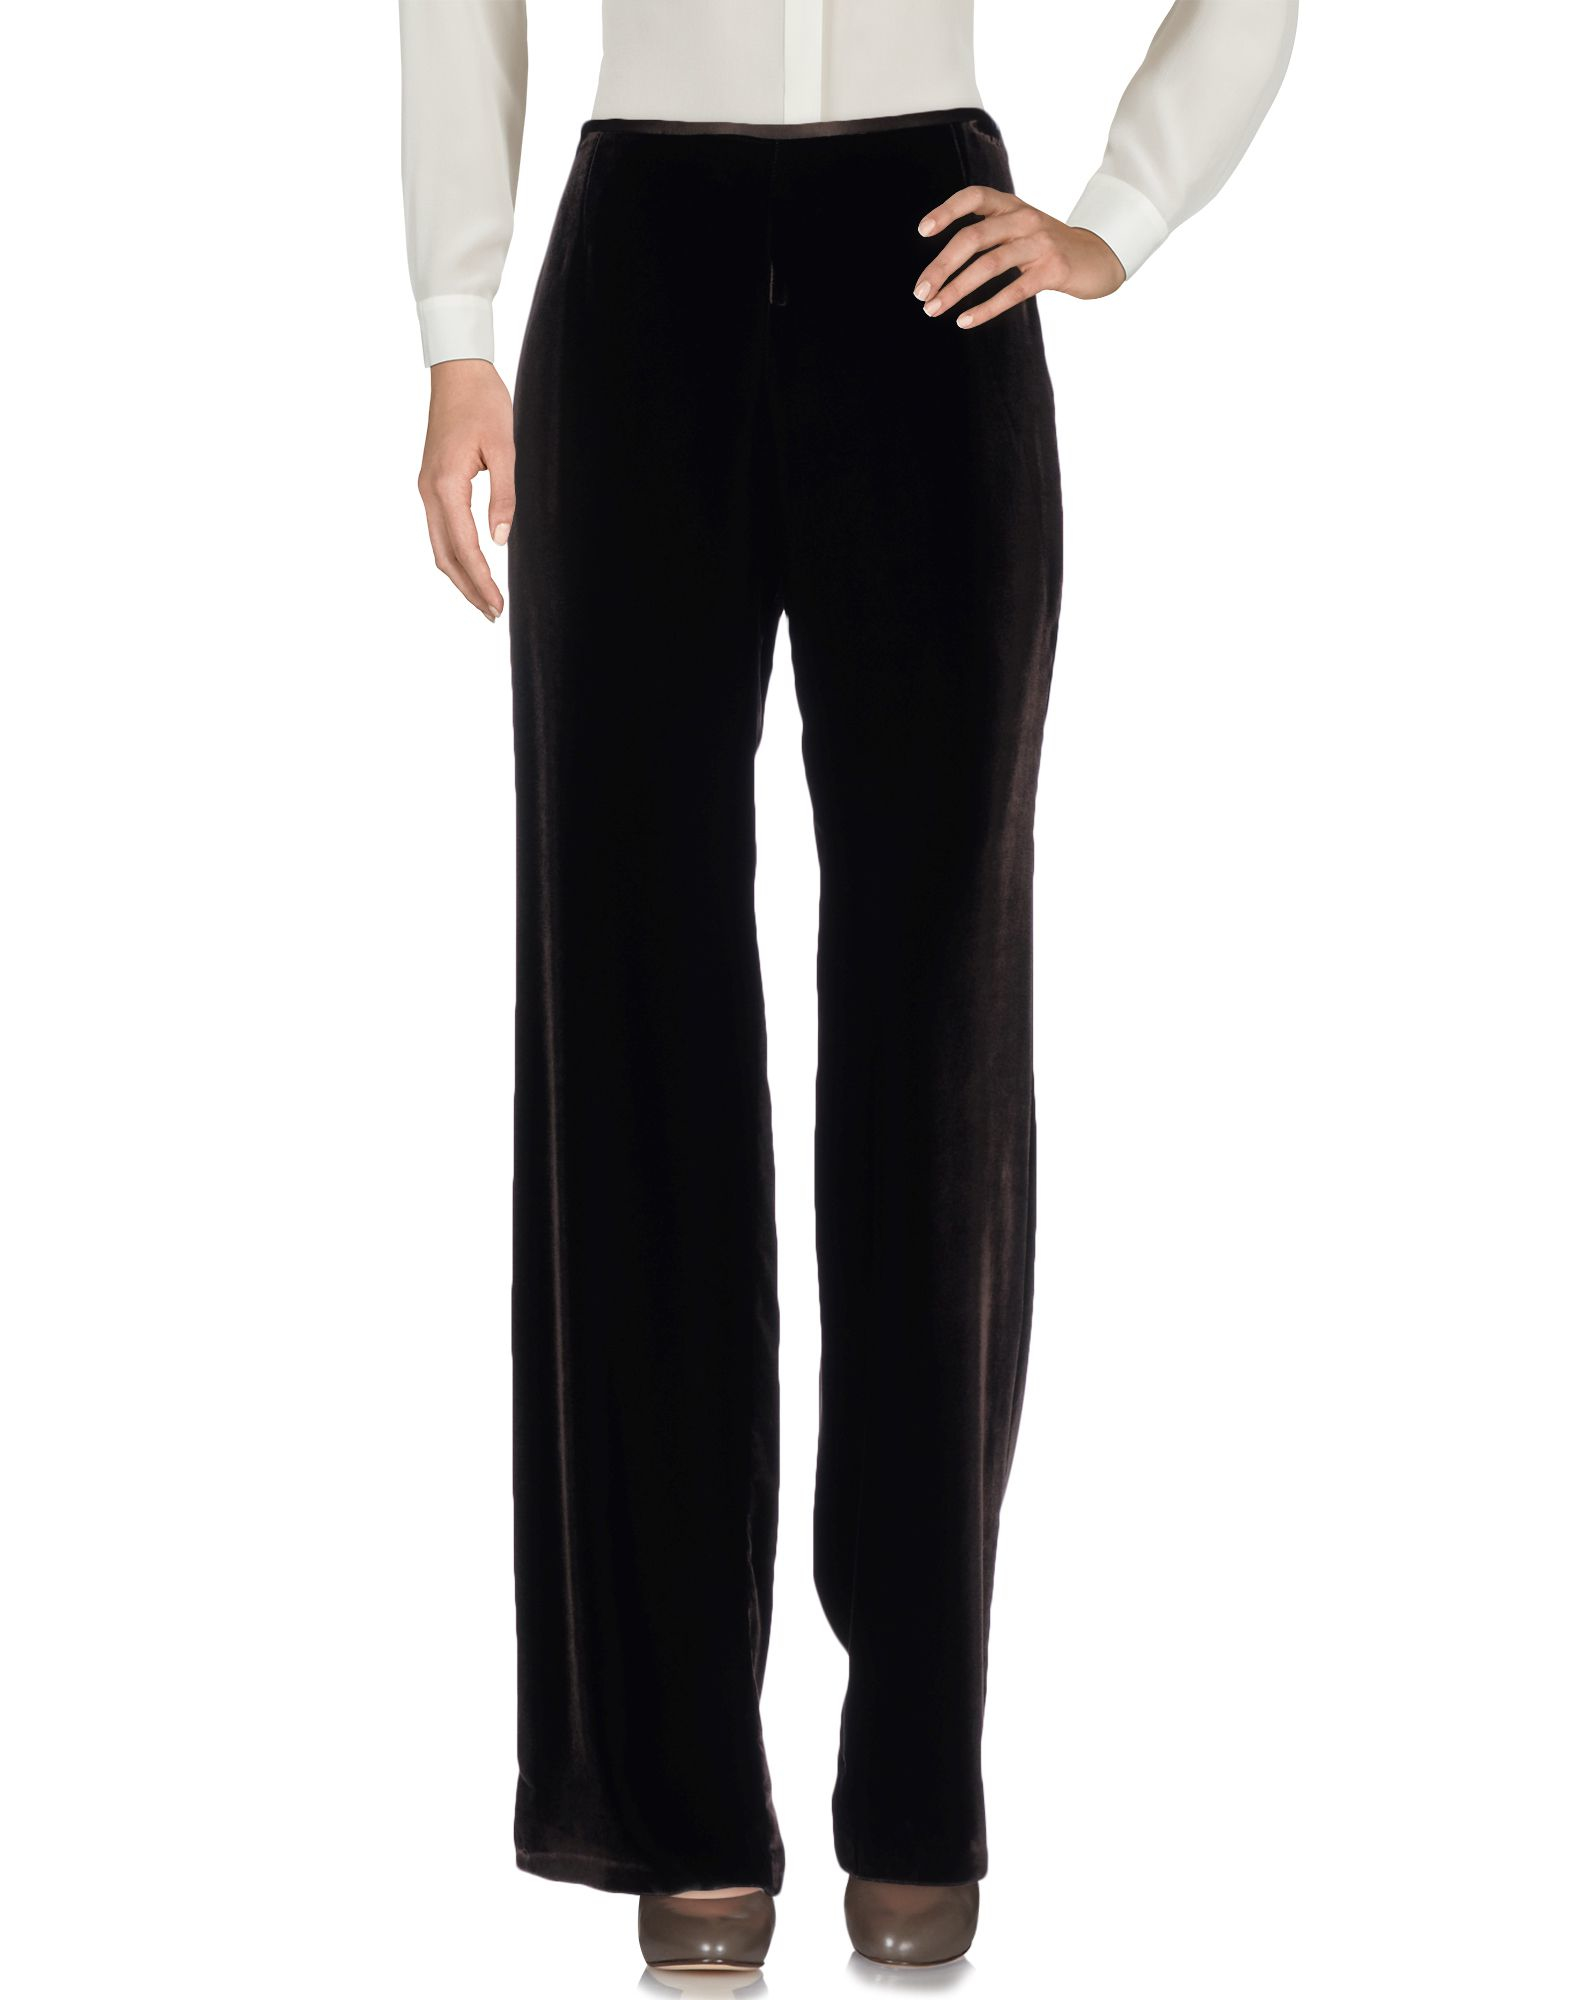 Wonderful Dark Brown Dress Pants Women  Wwwgalleryhipcom  The Hippest Pics